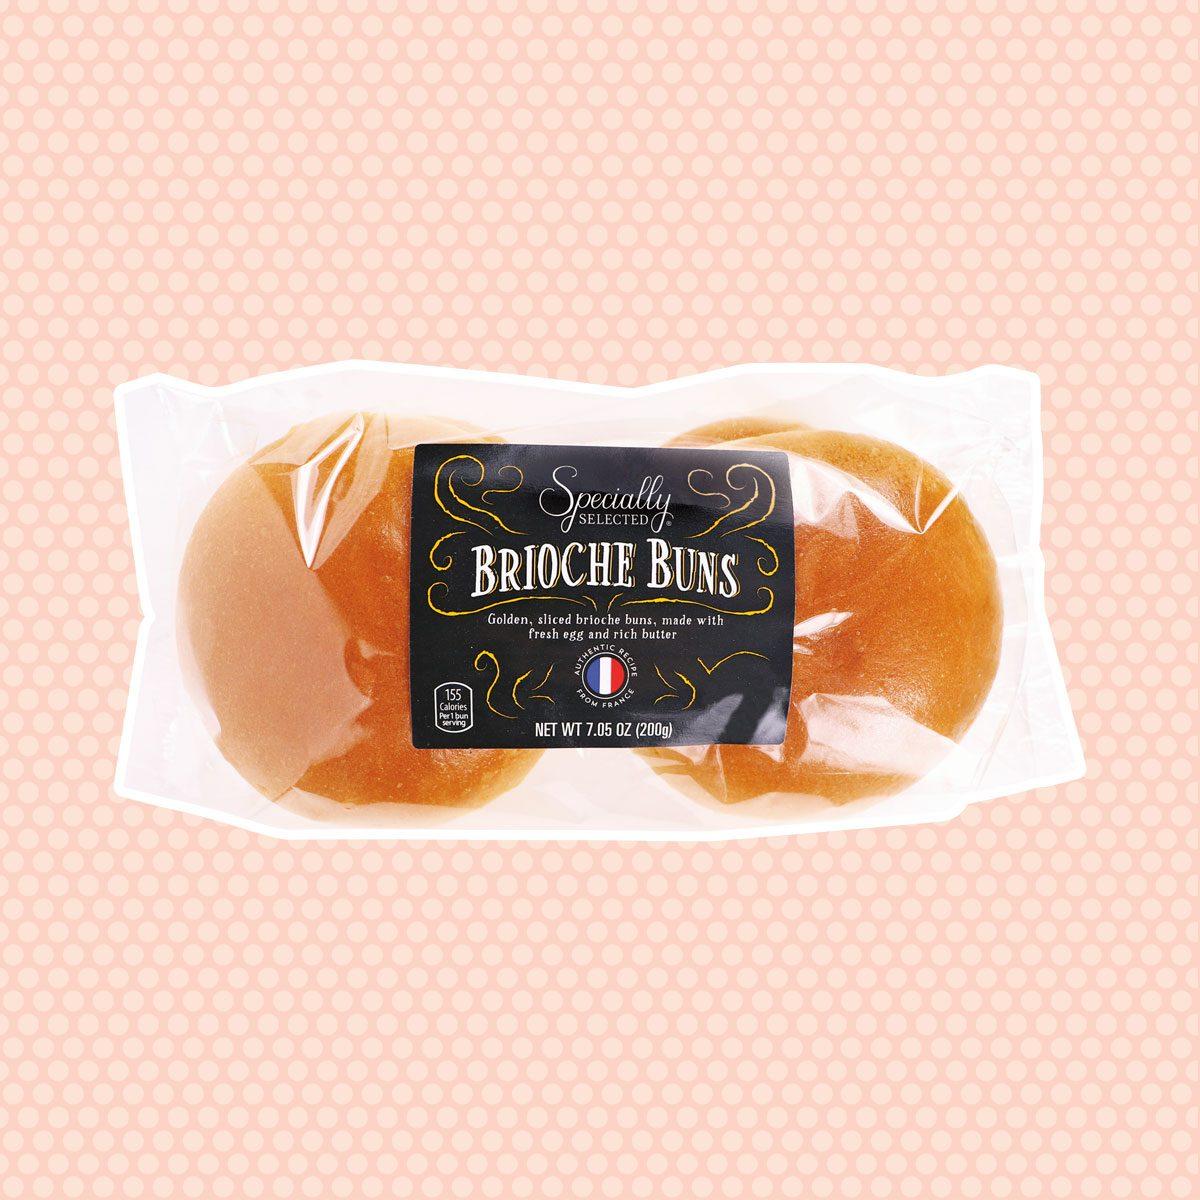 Specially Selected Brioche Buns